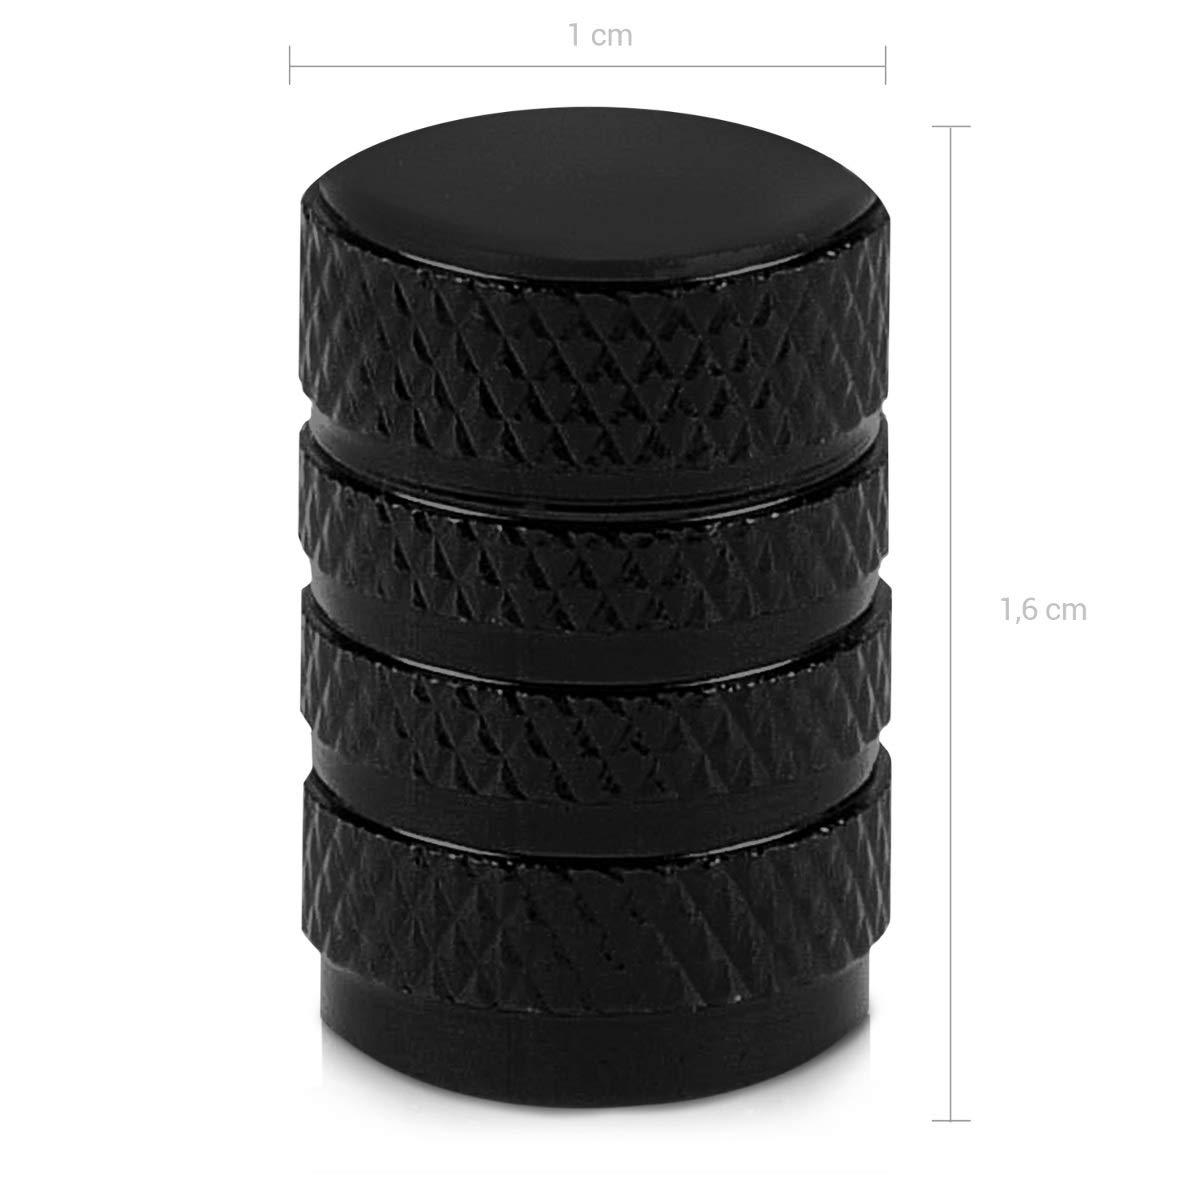 Metal Tire Valve Dust Caps for Car Set of 5 Tire Stem Car Wheel Dustproof Cap Motorcycle kwmobile 5x Valve Cap Bike